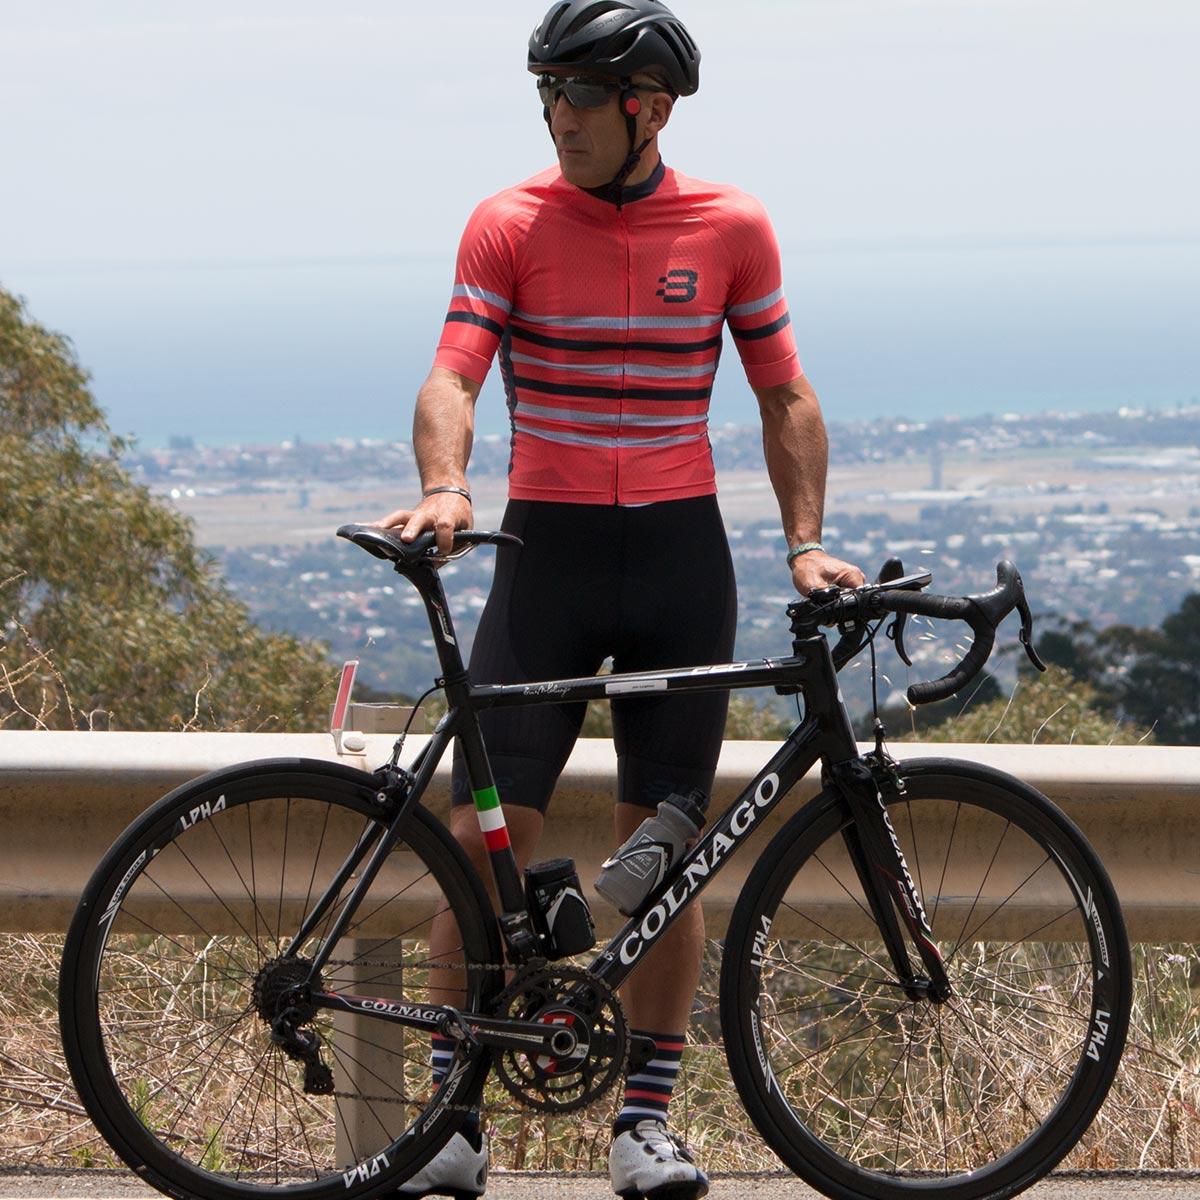 ... Mens Rails v2.0 Pro Fit - Cycling Jersey  2 - VL67953 - Full  Womens ... 95a7af04b